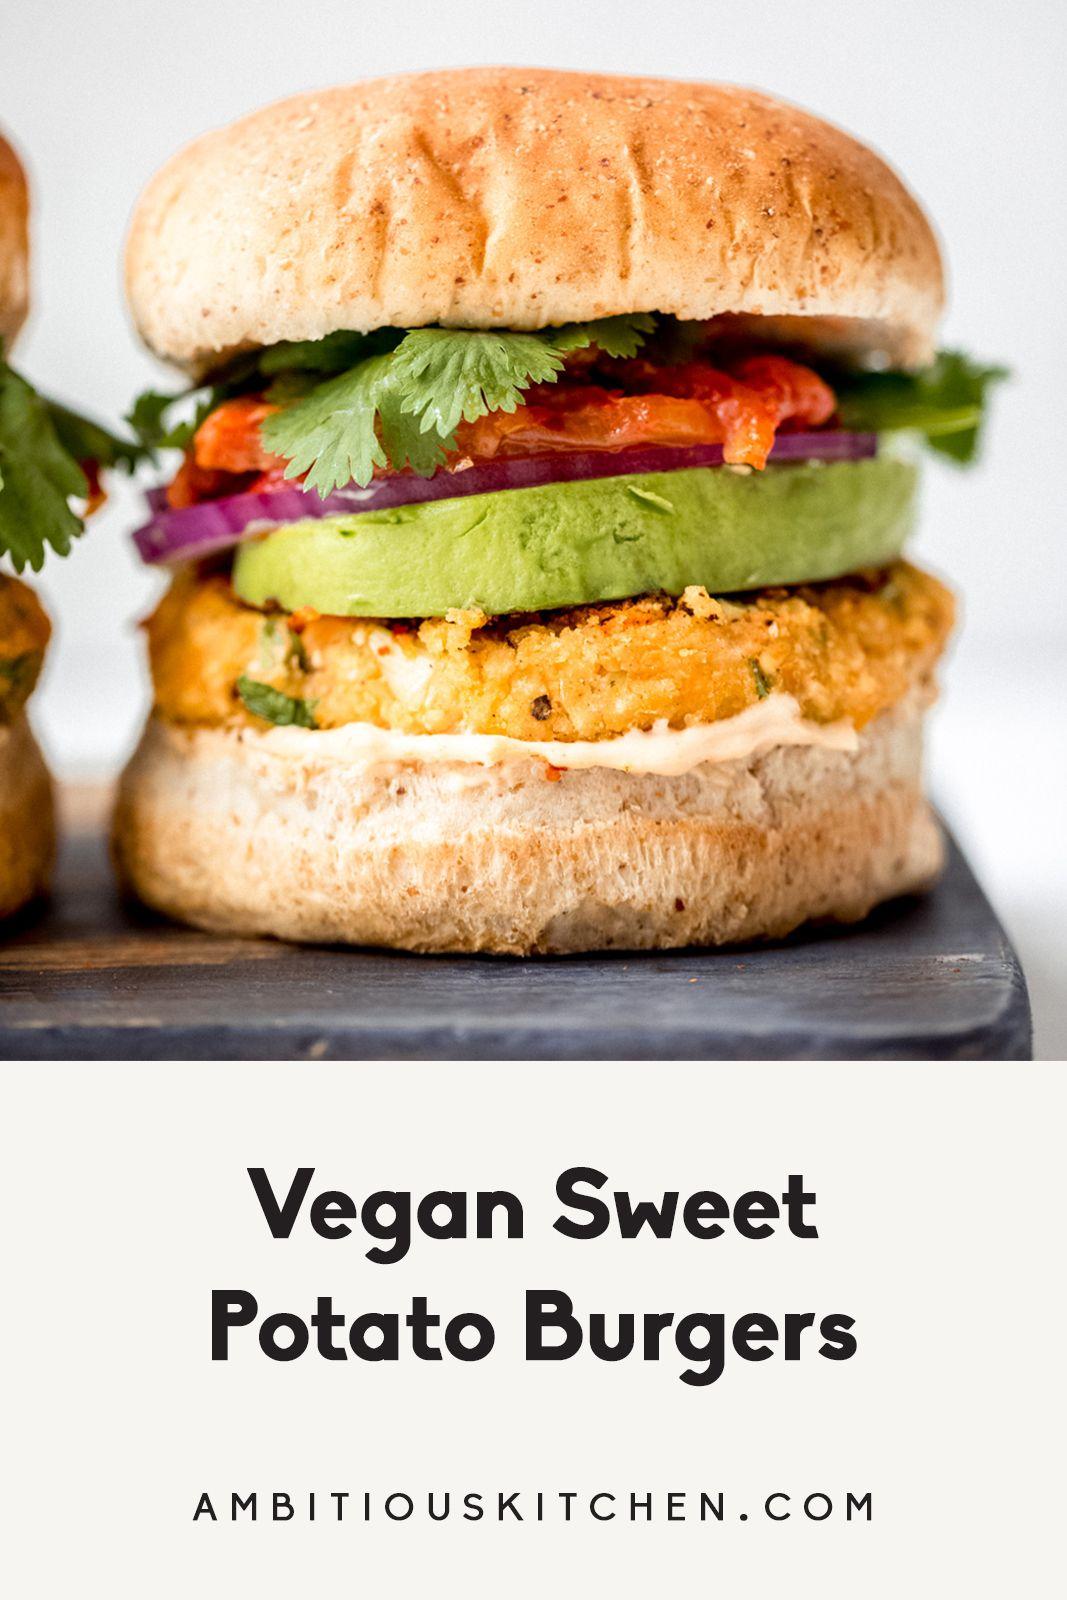 Vegan Sweet Potato Burgers Recipe Vegan Sweet Potato Burger Sweet Potato Burgers Vegan Sweet Potato